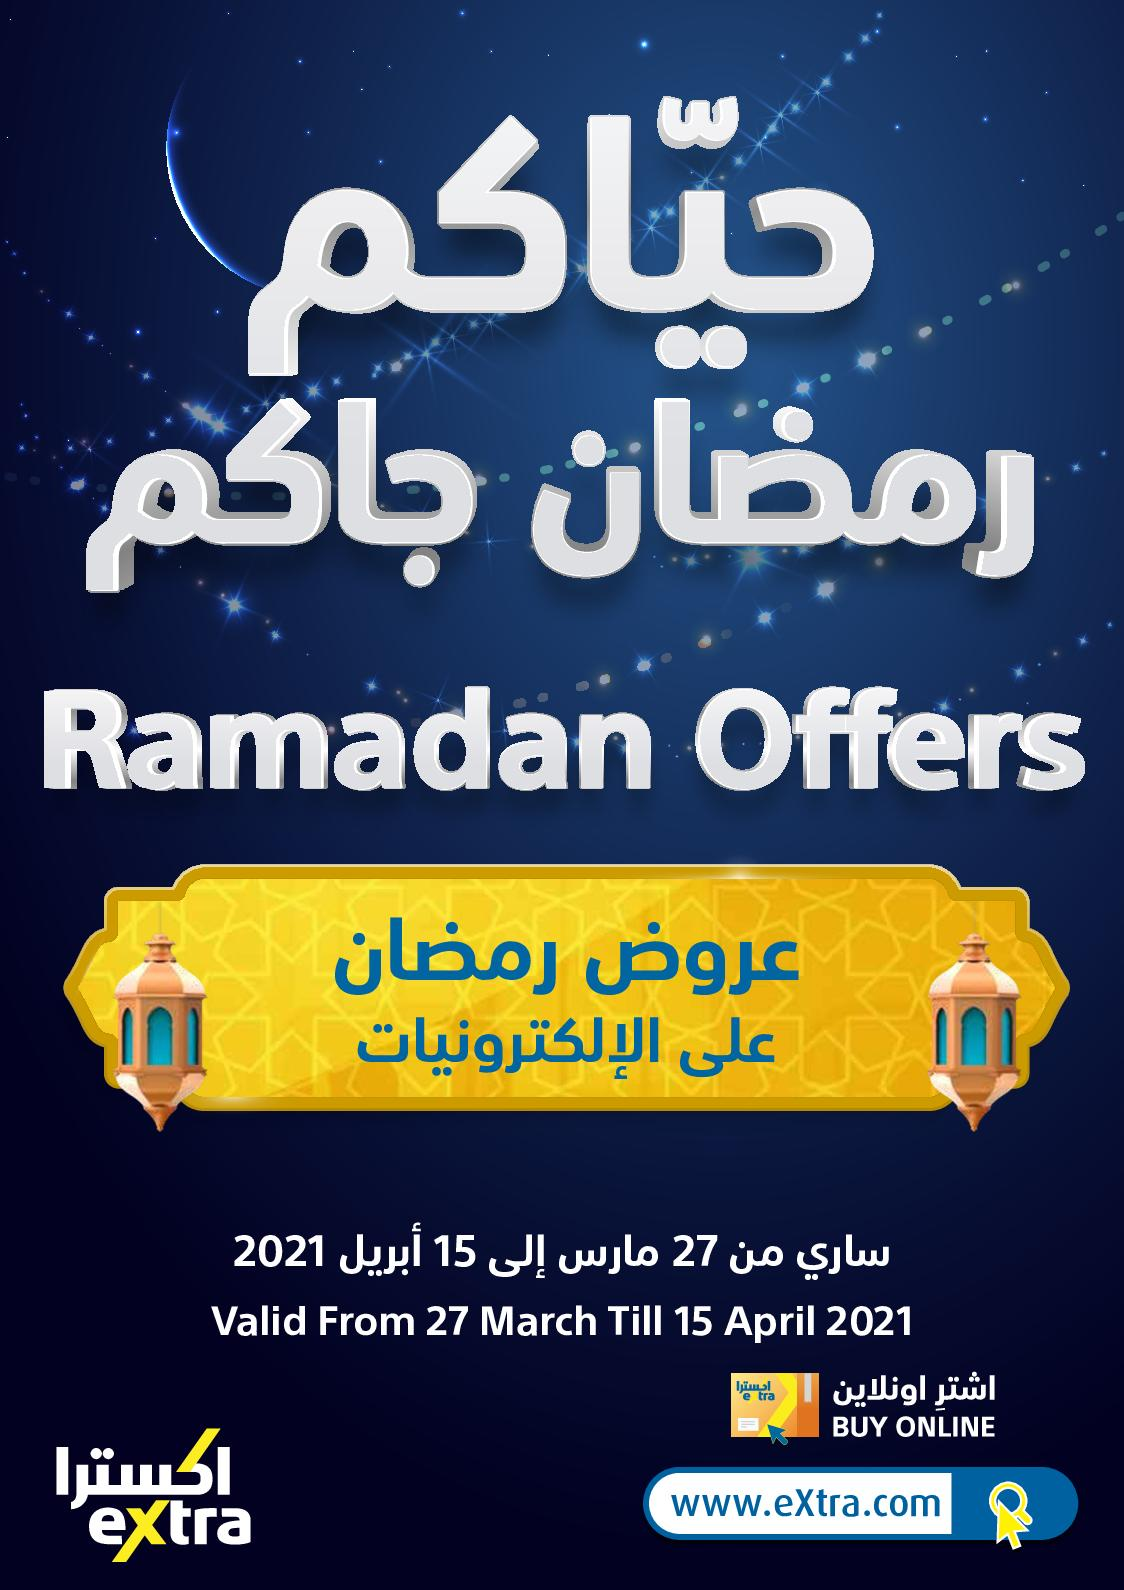 Ramadan Offers 2021